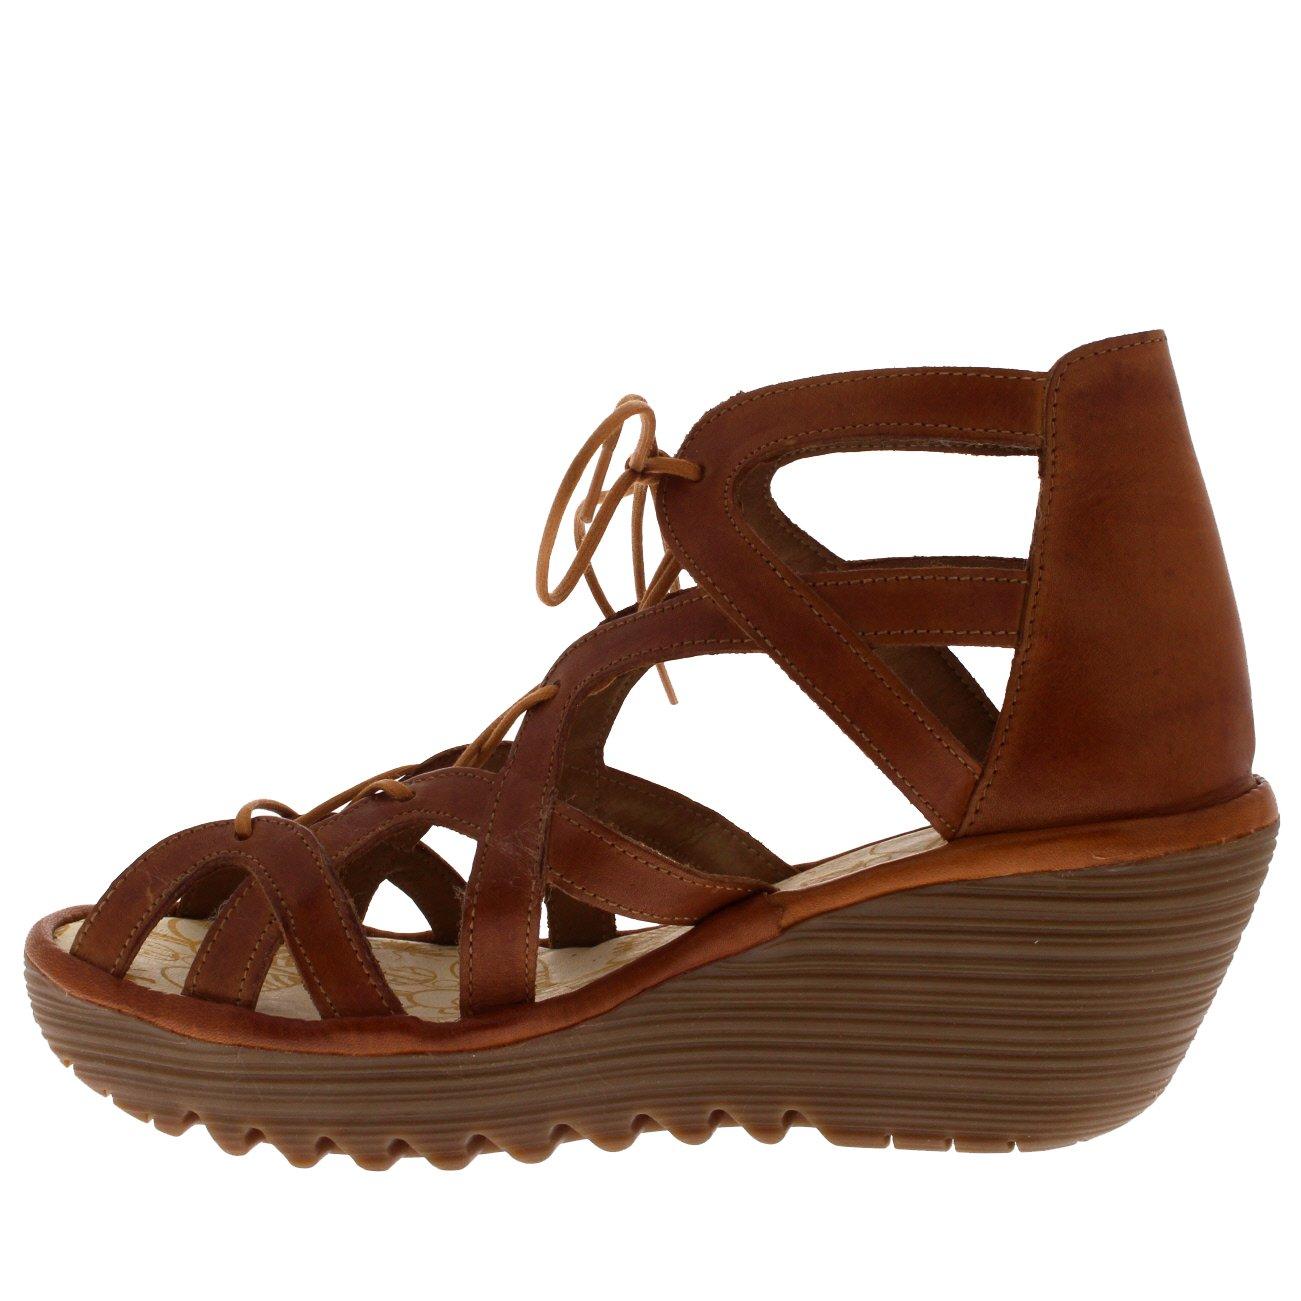 FLY London Womens YELI719FLY Wedge Leather Sandals B07B66XL8G UK7 - EU40 - US9 - AU8 Tan